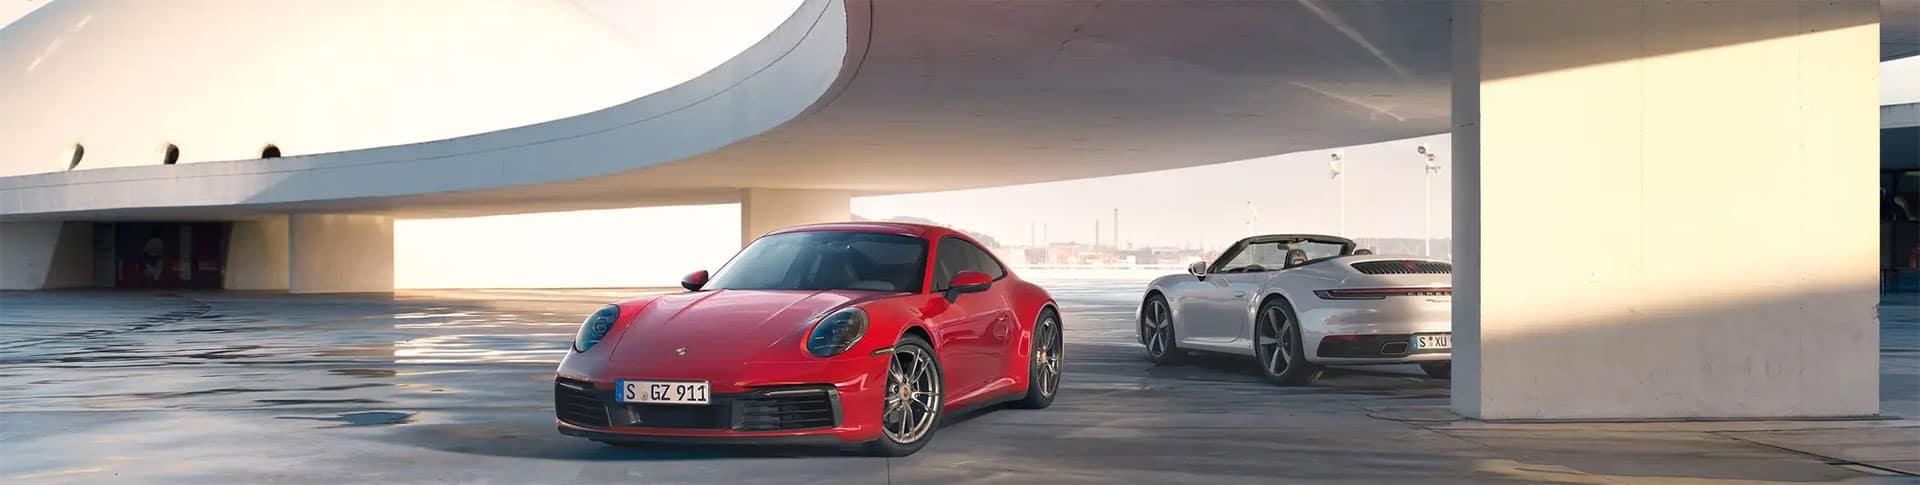 Porsche Financial Services Offers